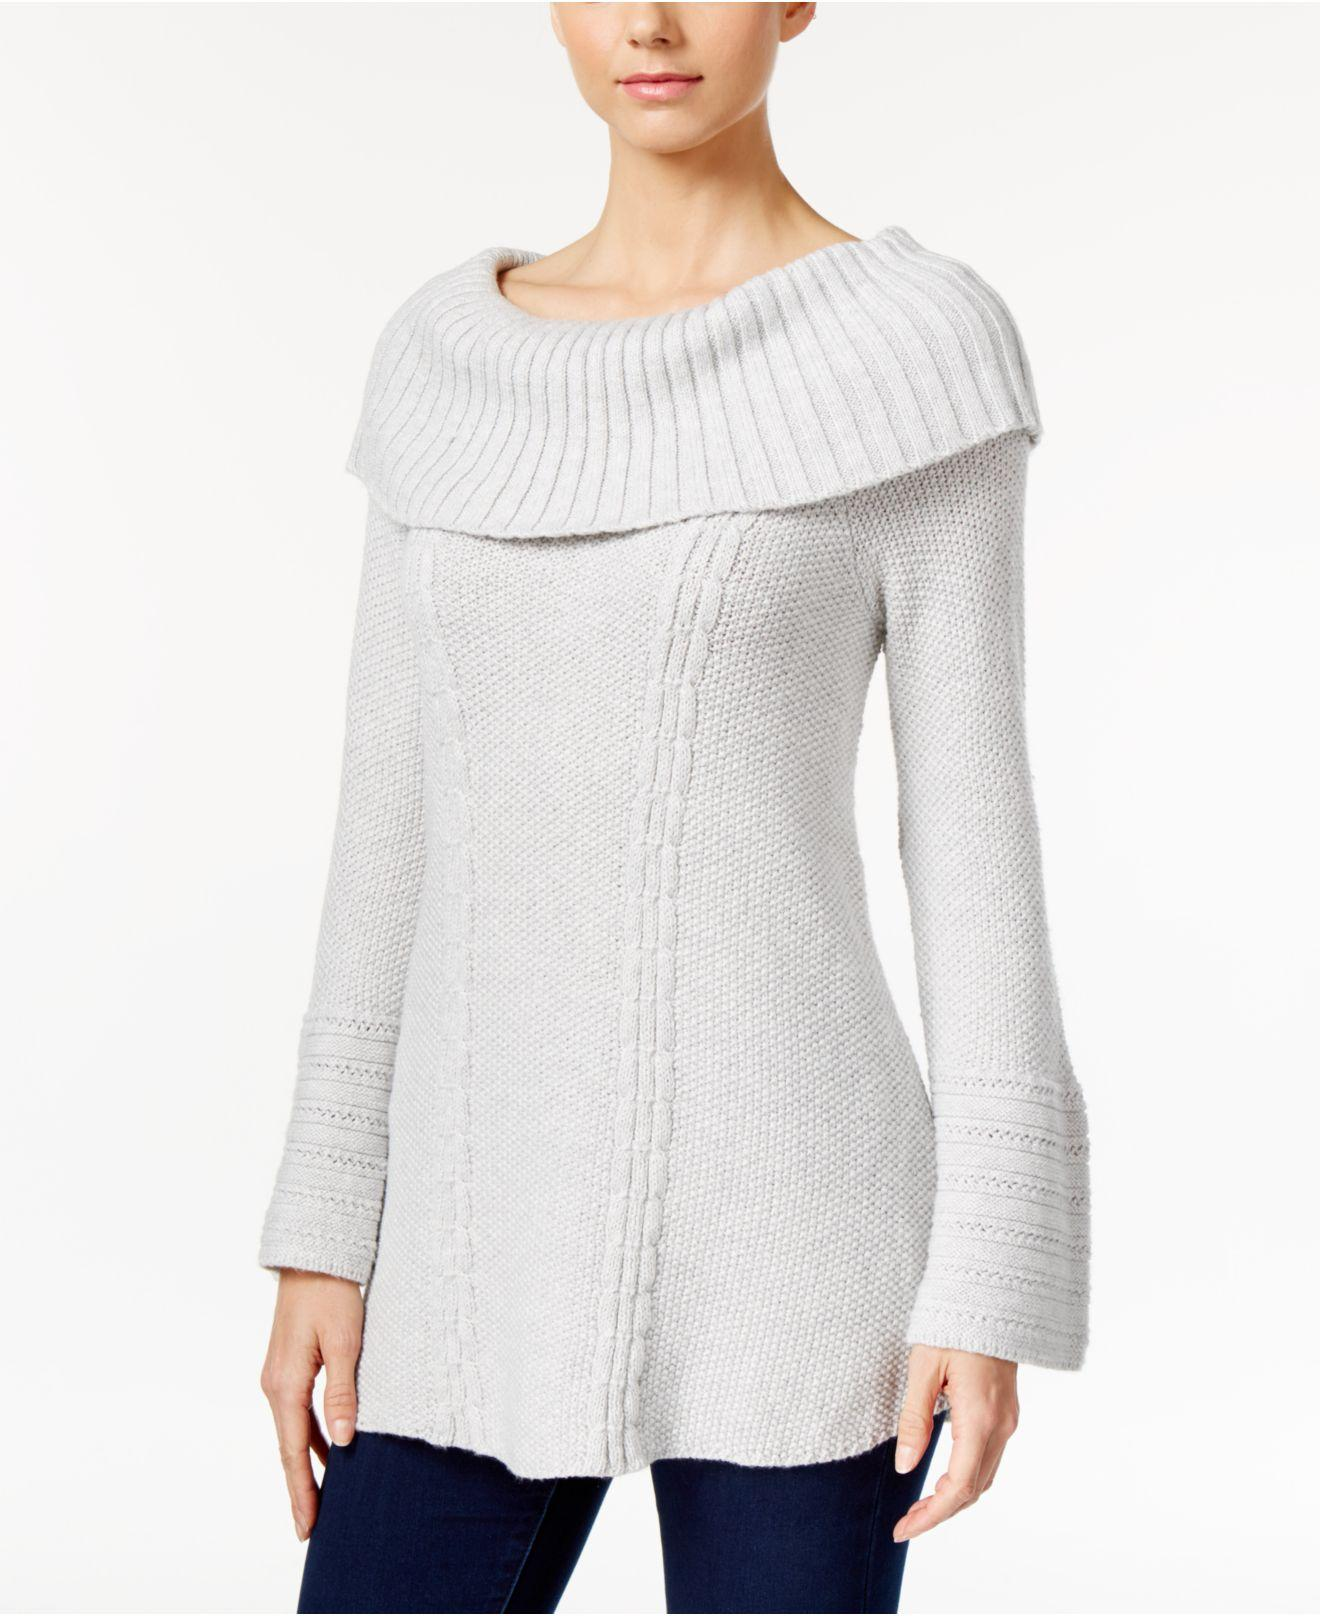 Style Co Petite Lace-Hem Bell-Sleeve Sweater Warm Ivory PL